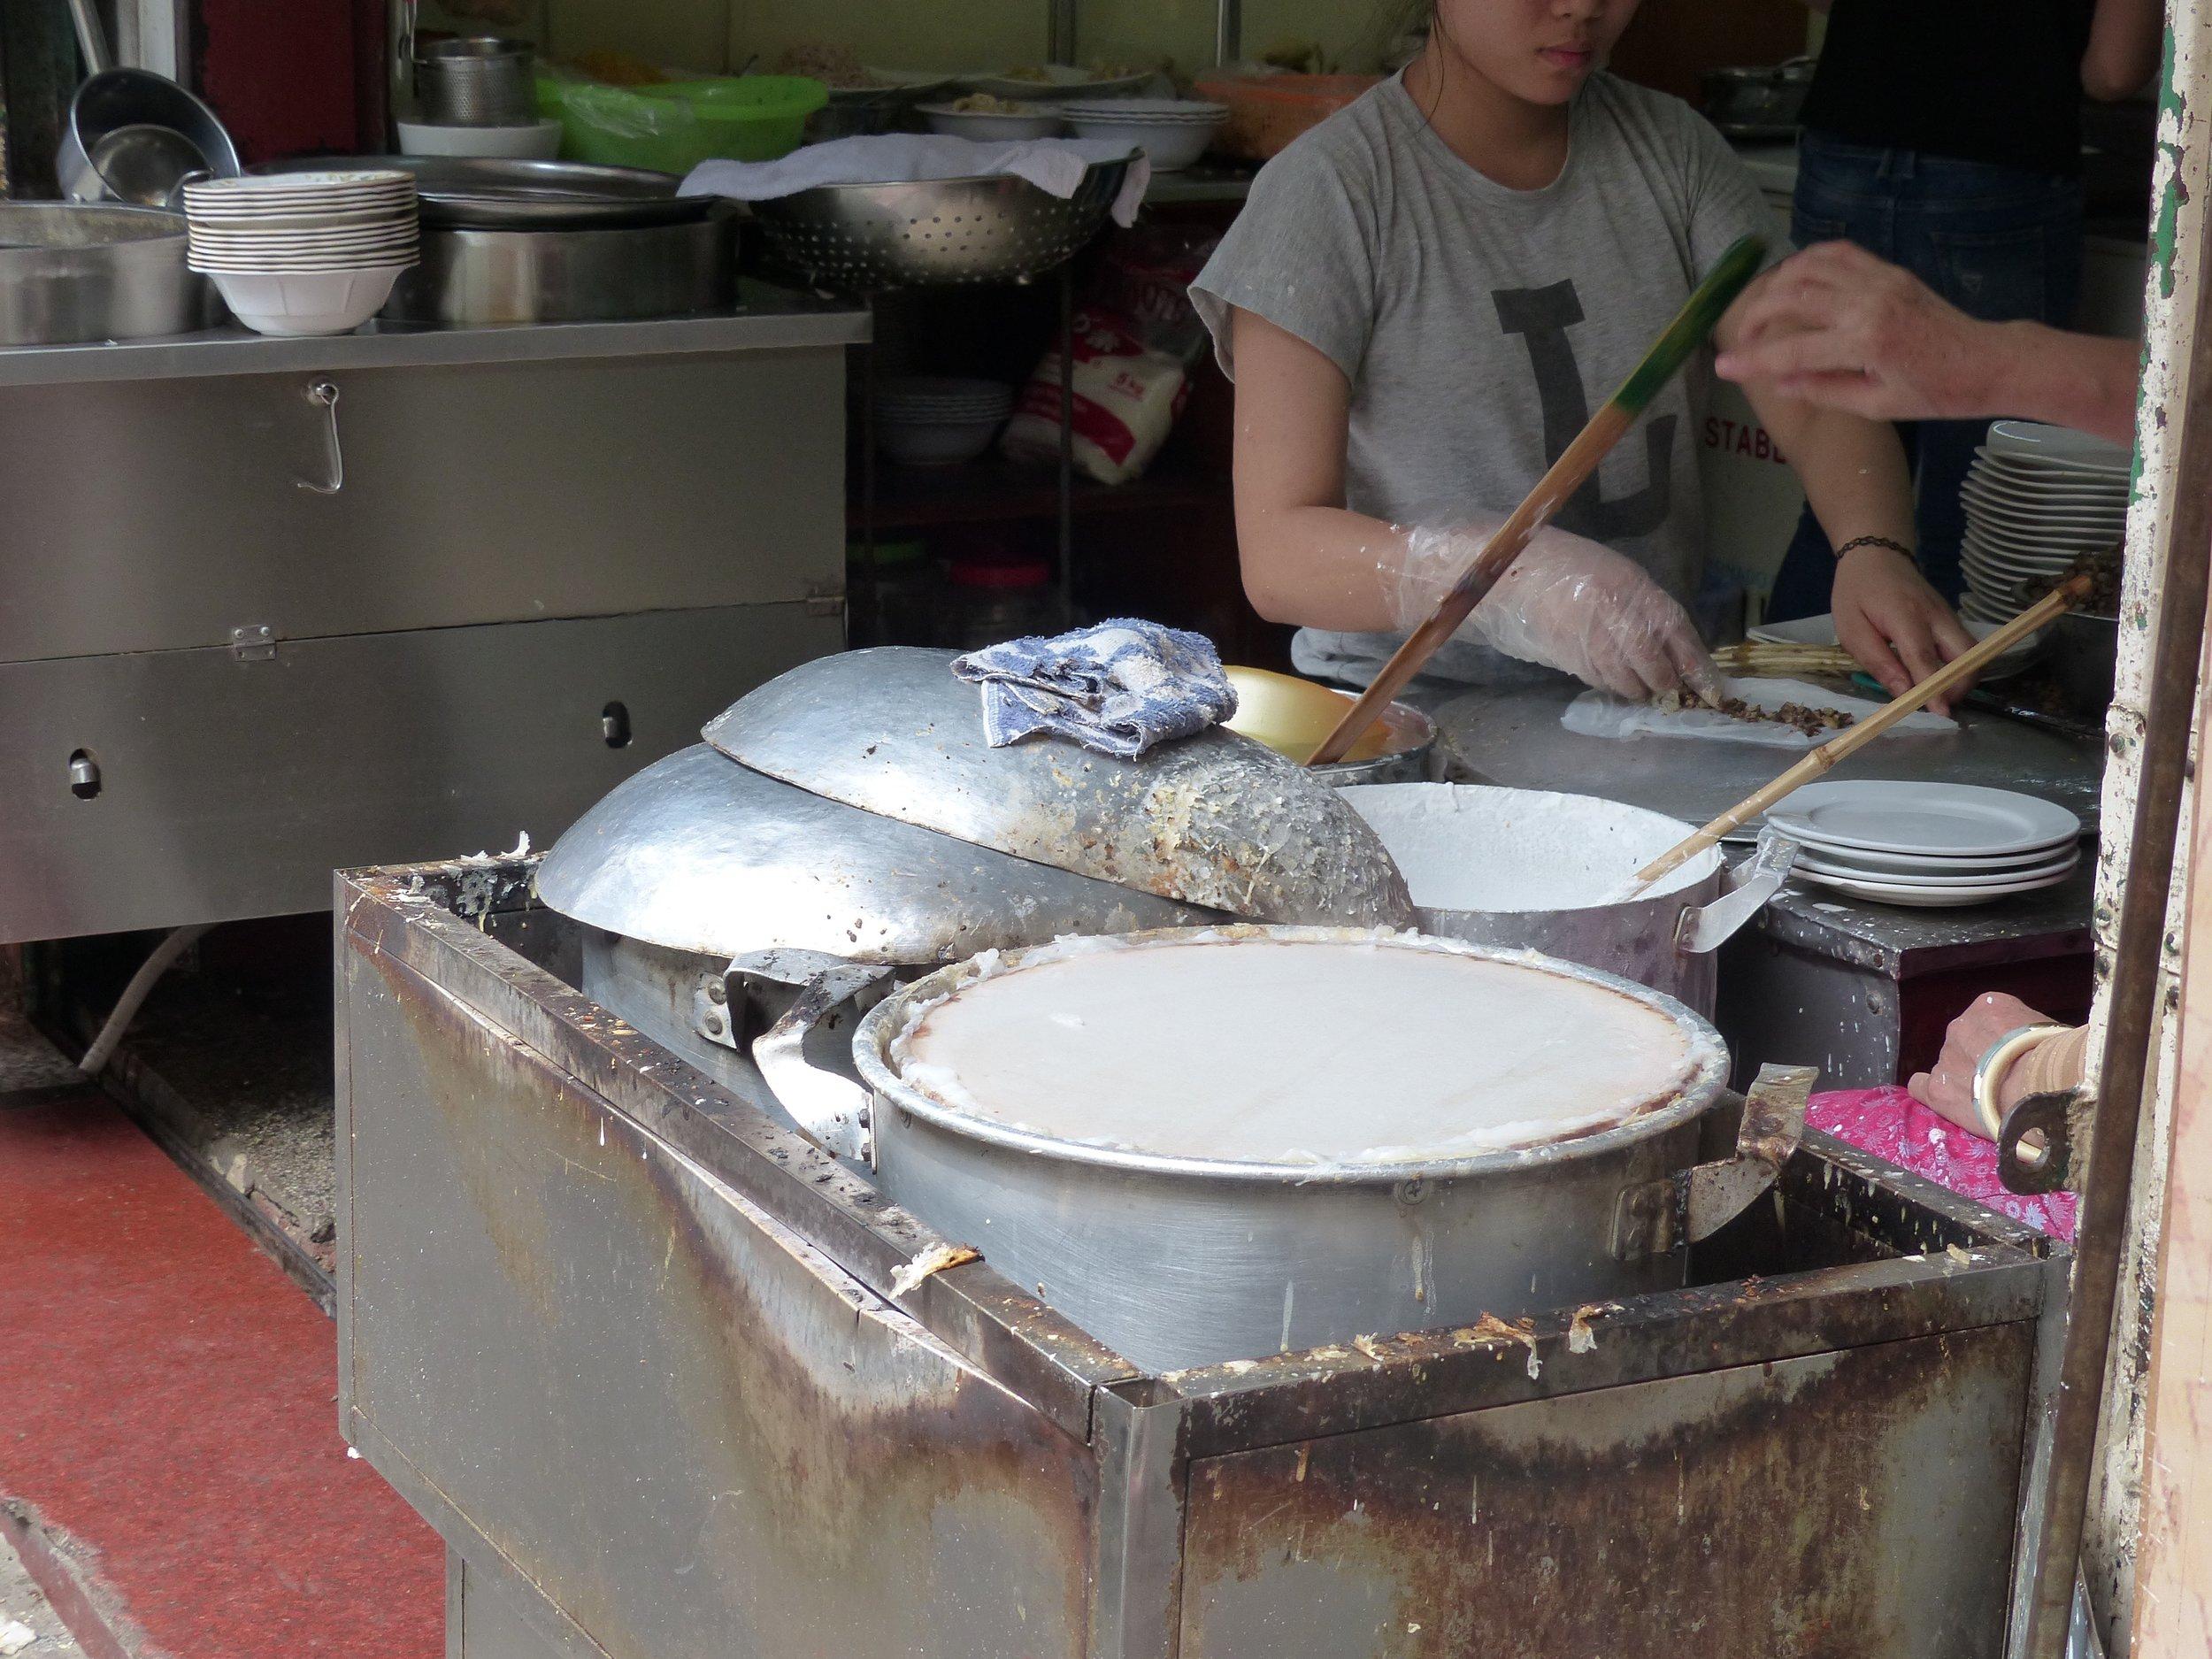 Street food restaurants have a rhythm to their process.